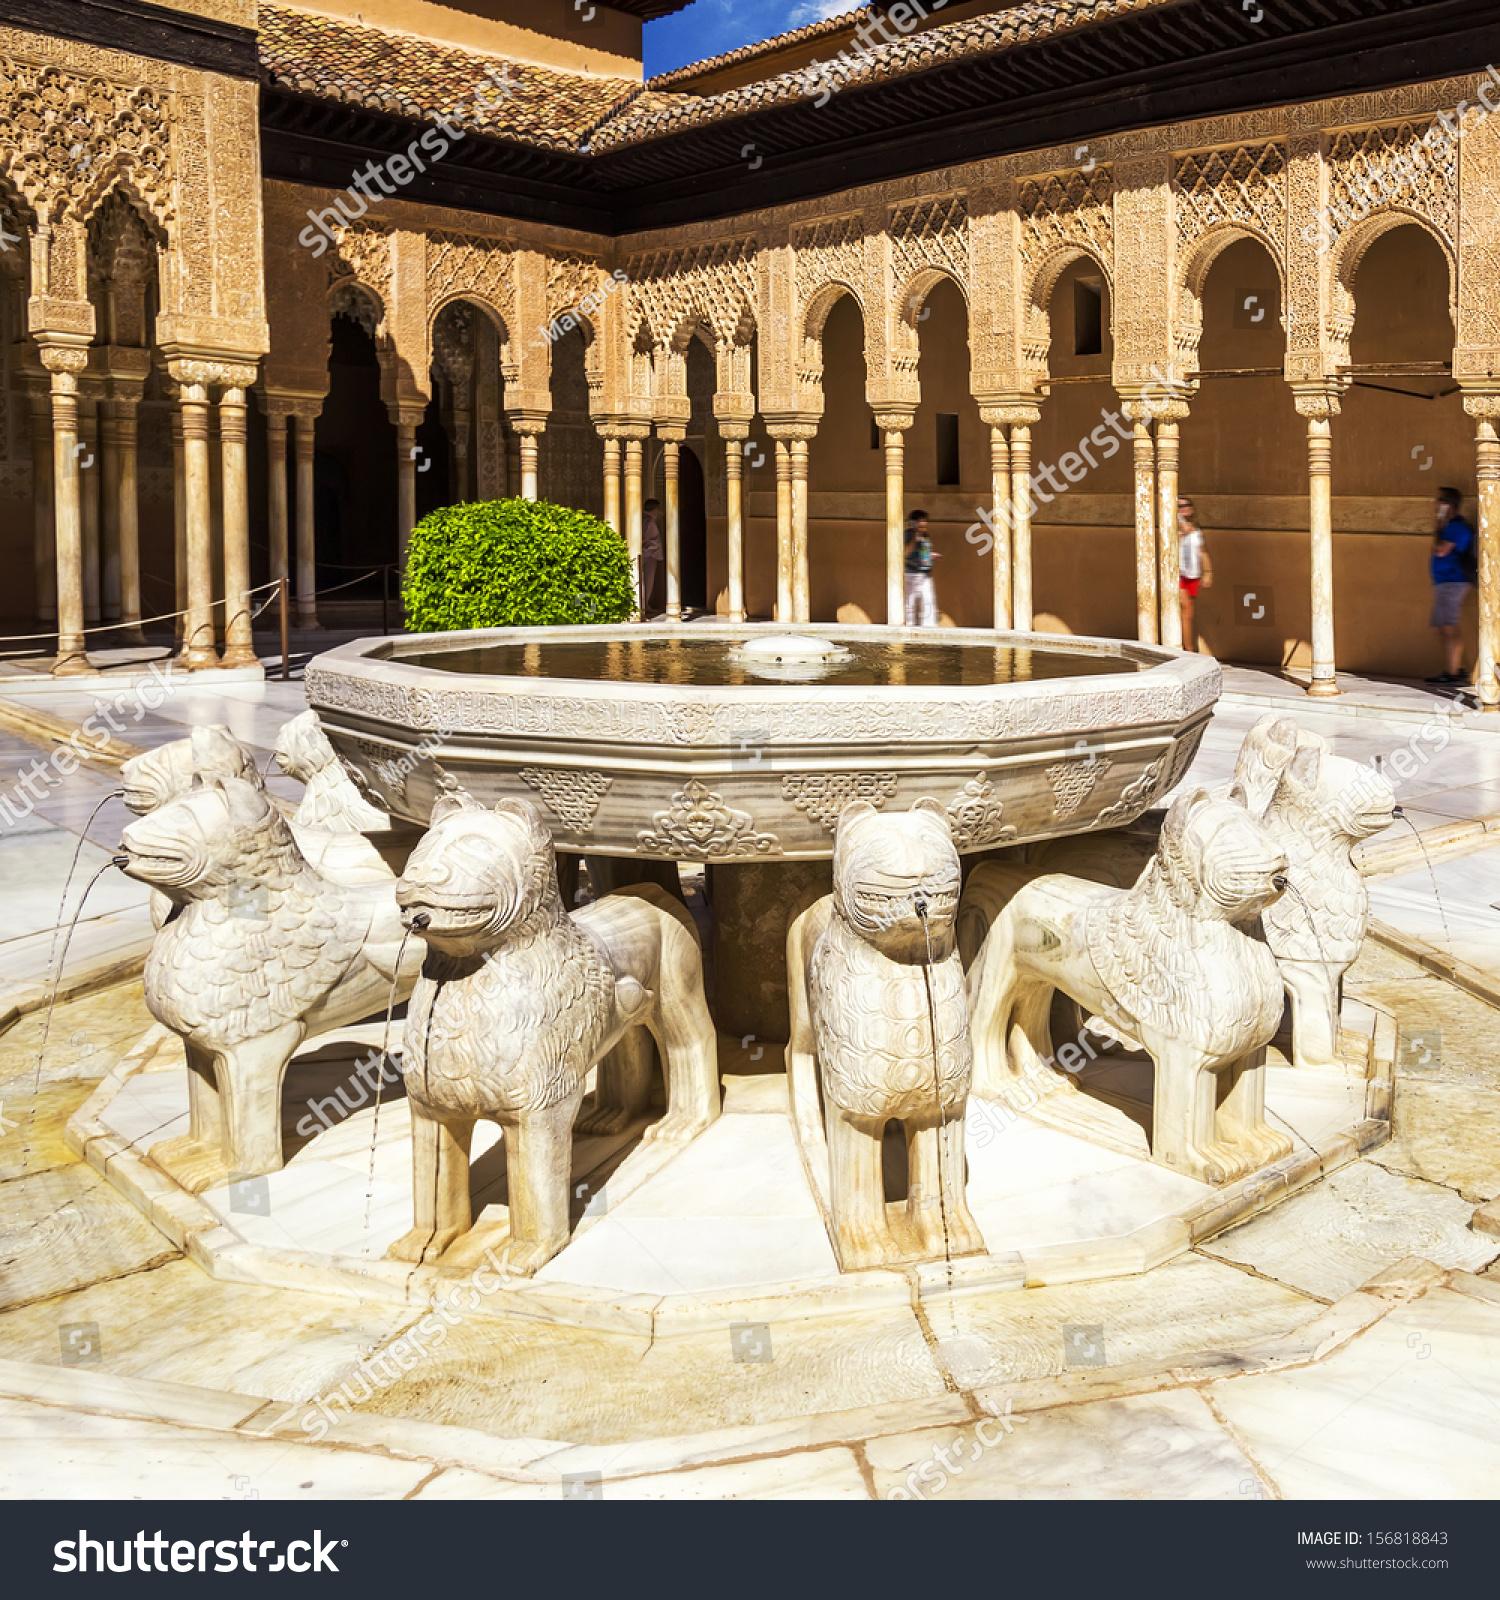 Alhambra Sage Granada Park Alhambra Ca: Famous Lion Fountain Alhambra Palace Granada Stock Photo